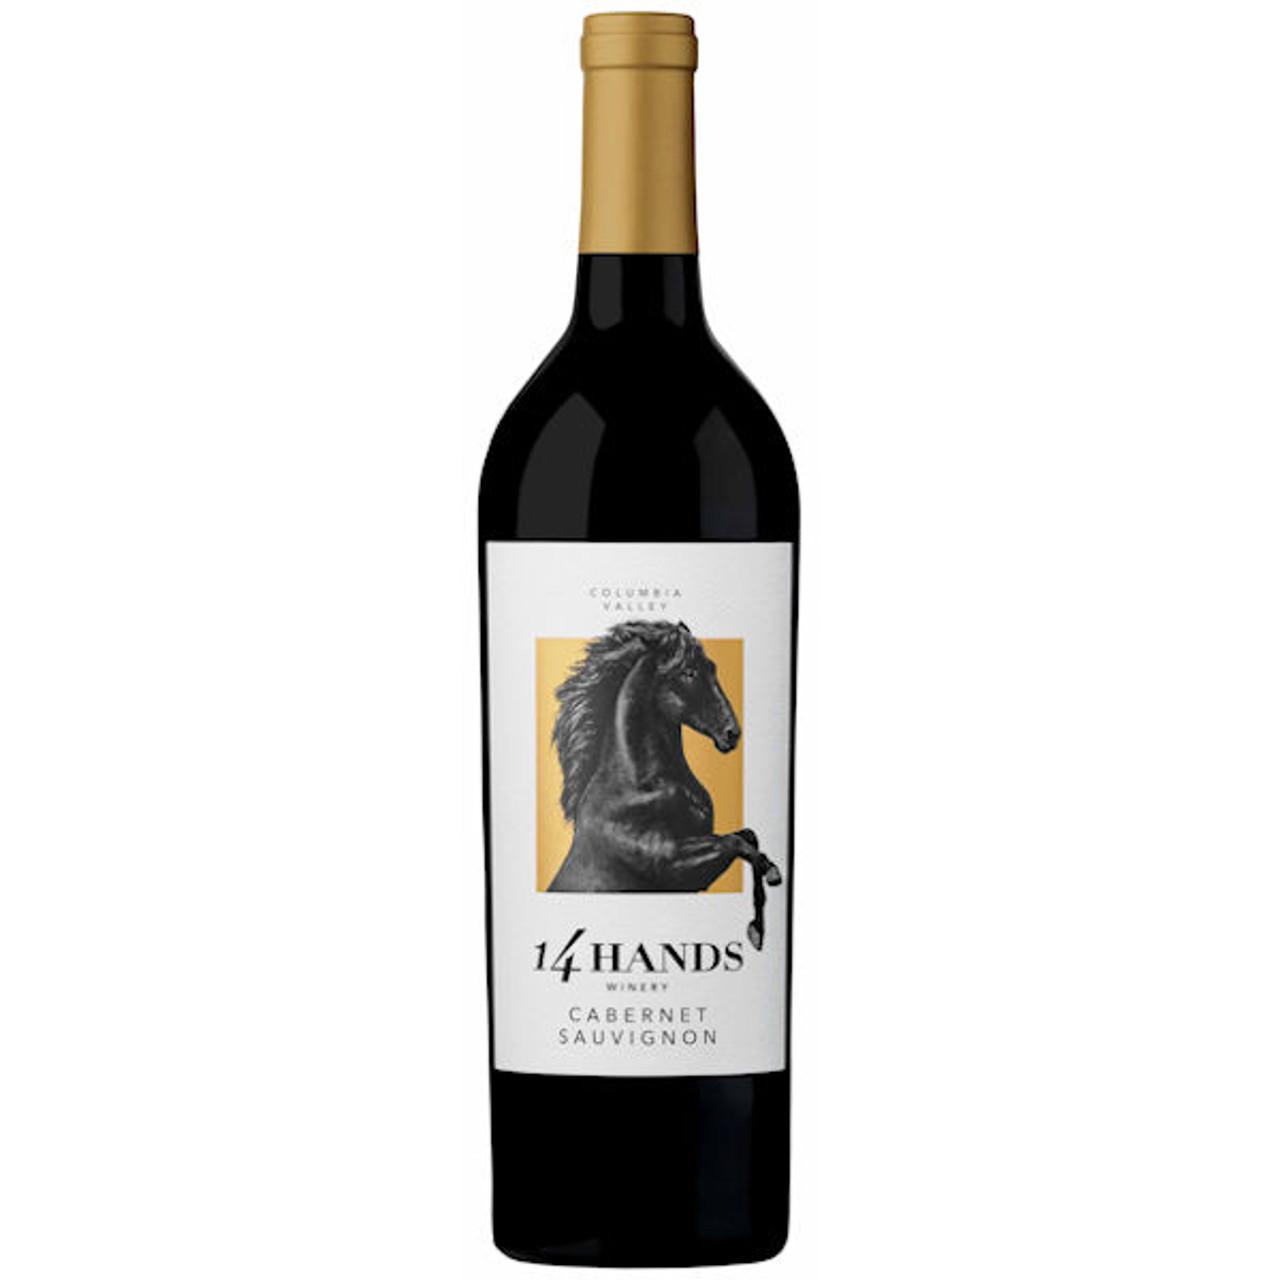 14 Hands Washington Cabernet 2016